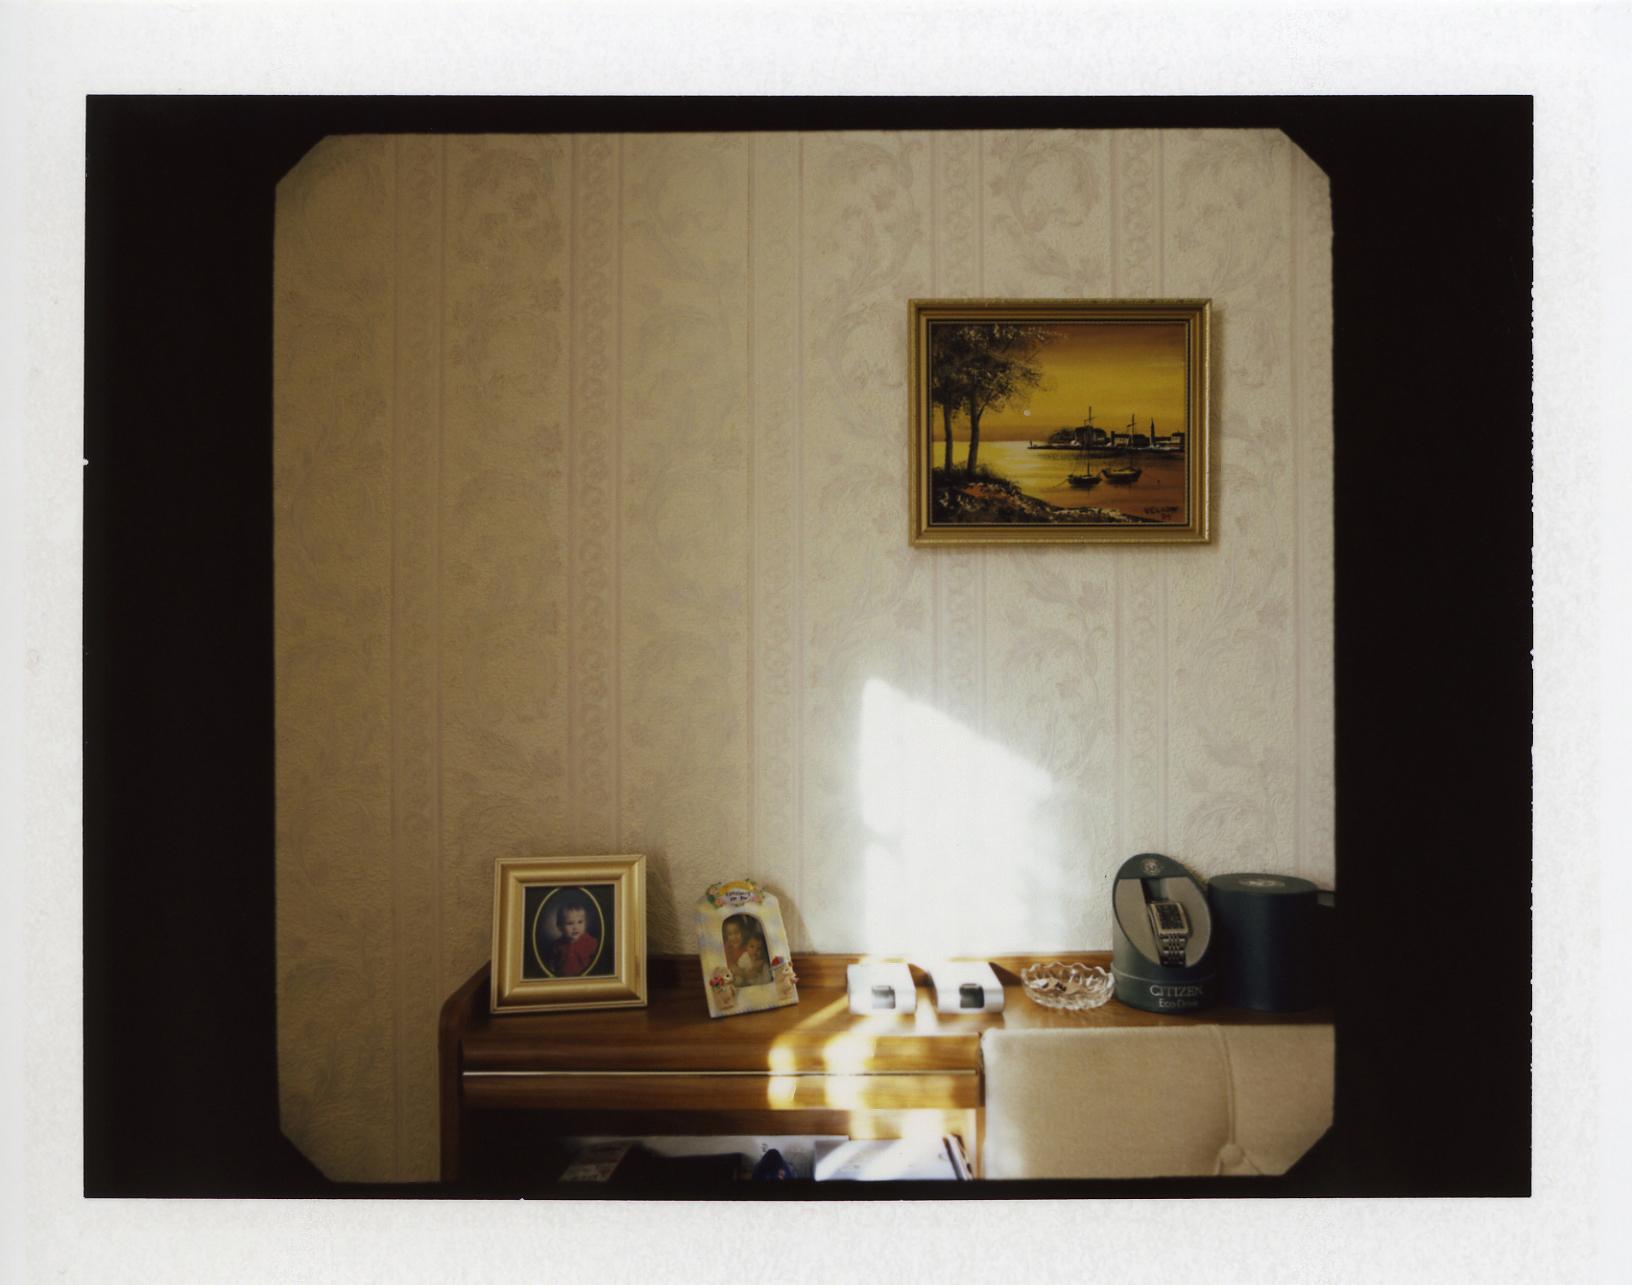 polaroid005sharpen.jpg